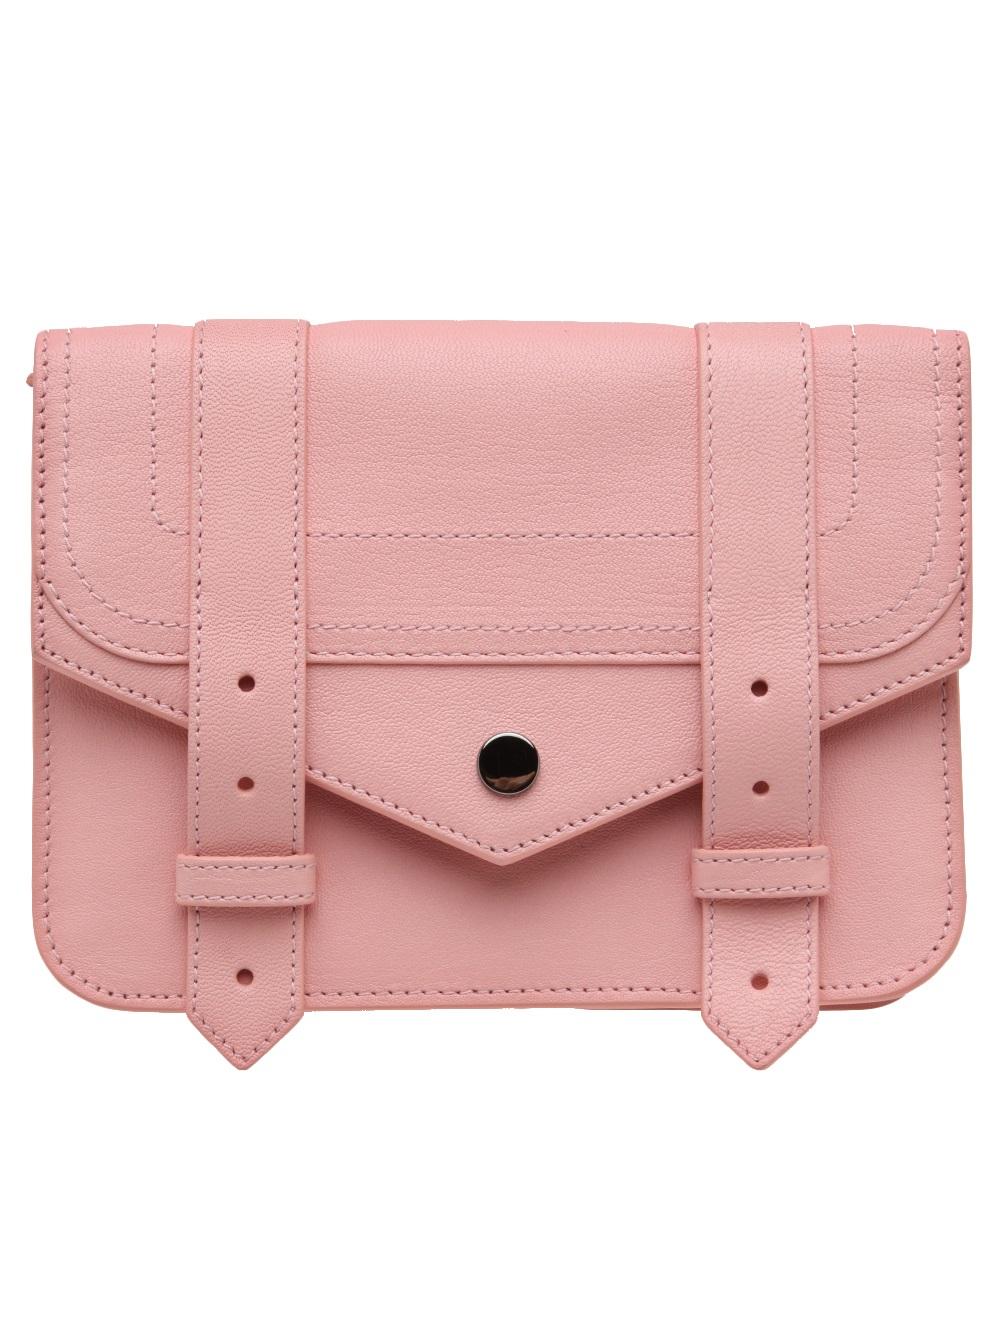 94efa59f871e proenza-schouler-pink-purple-ps1-long-chain-wallet-product-1-14558130-093042471.jpeg